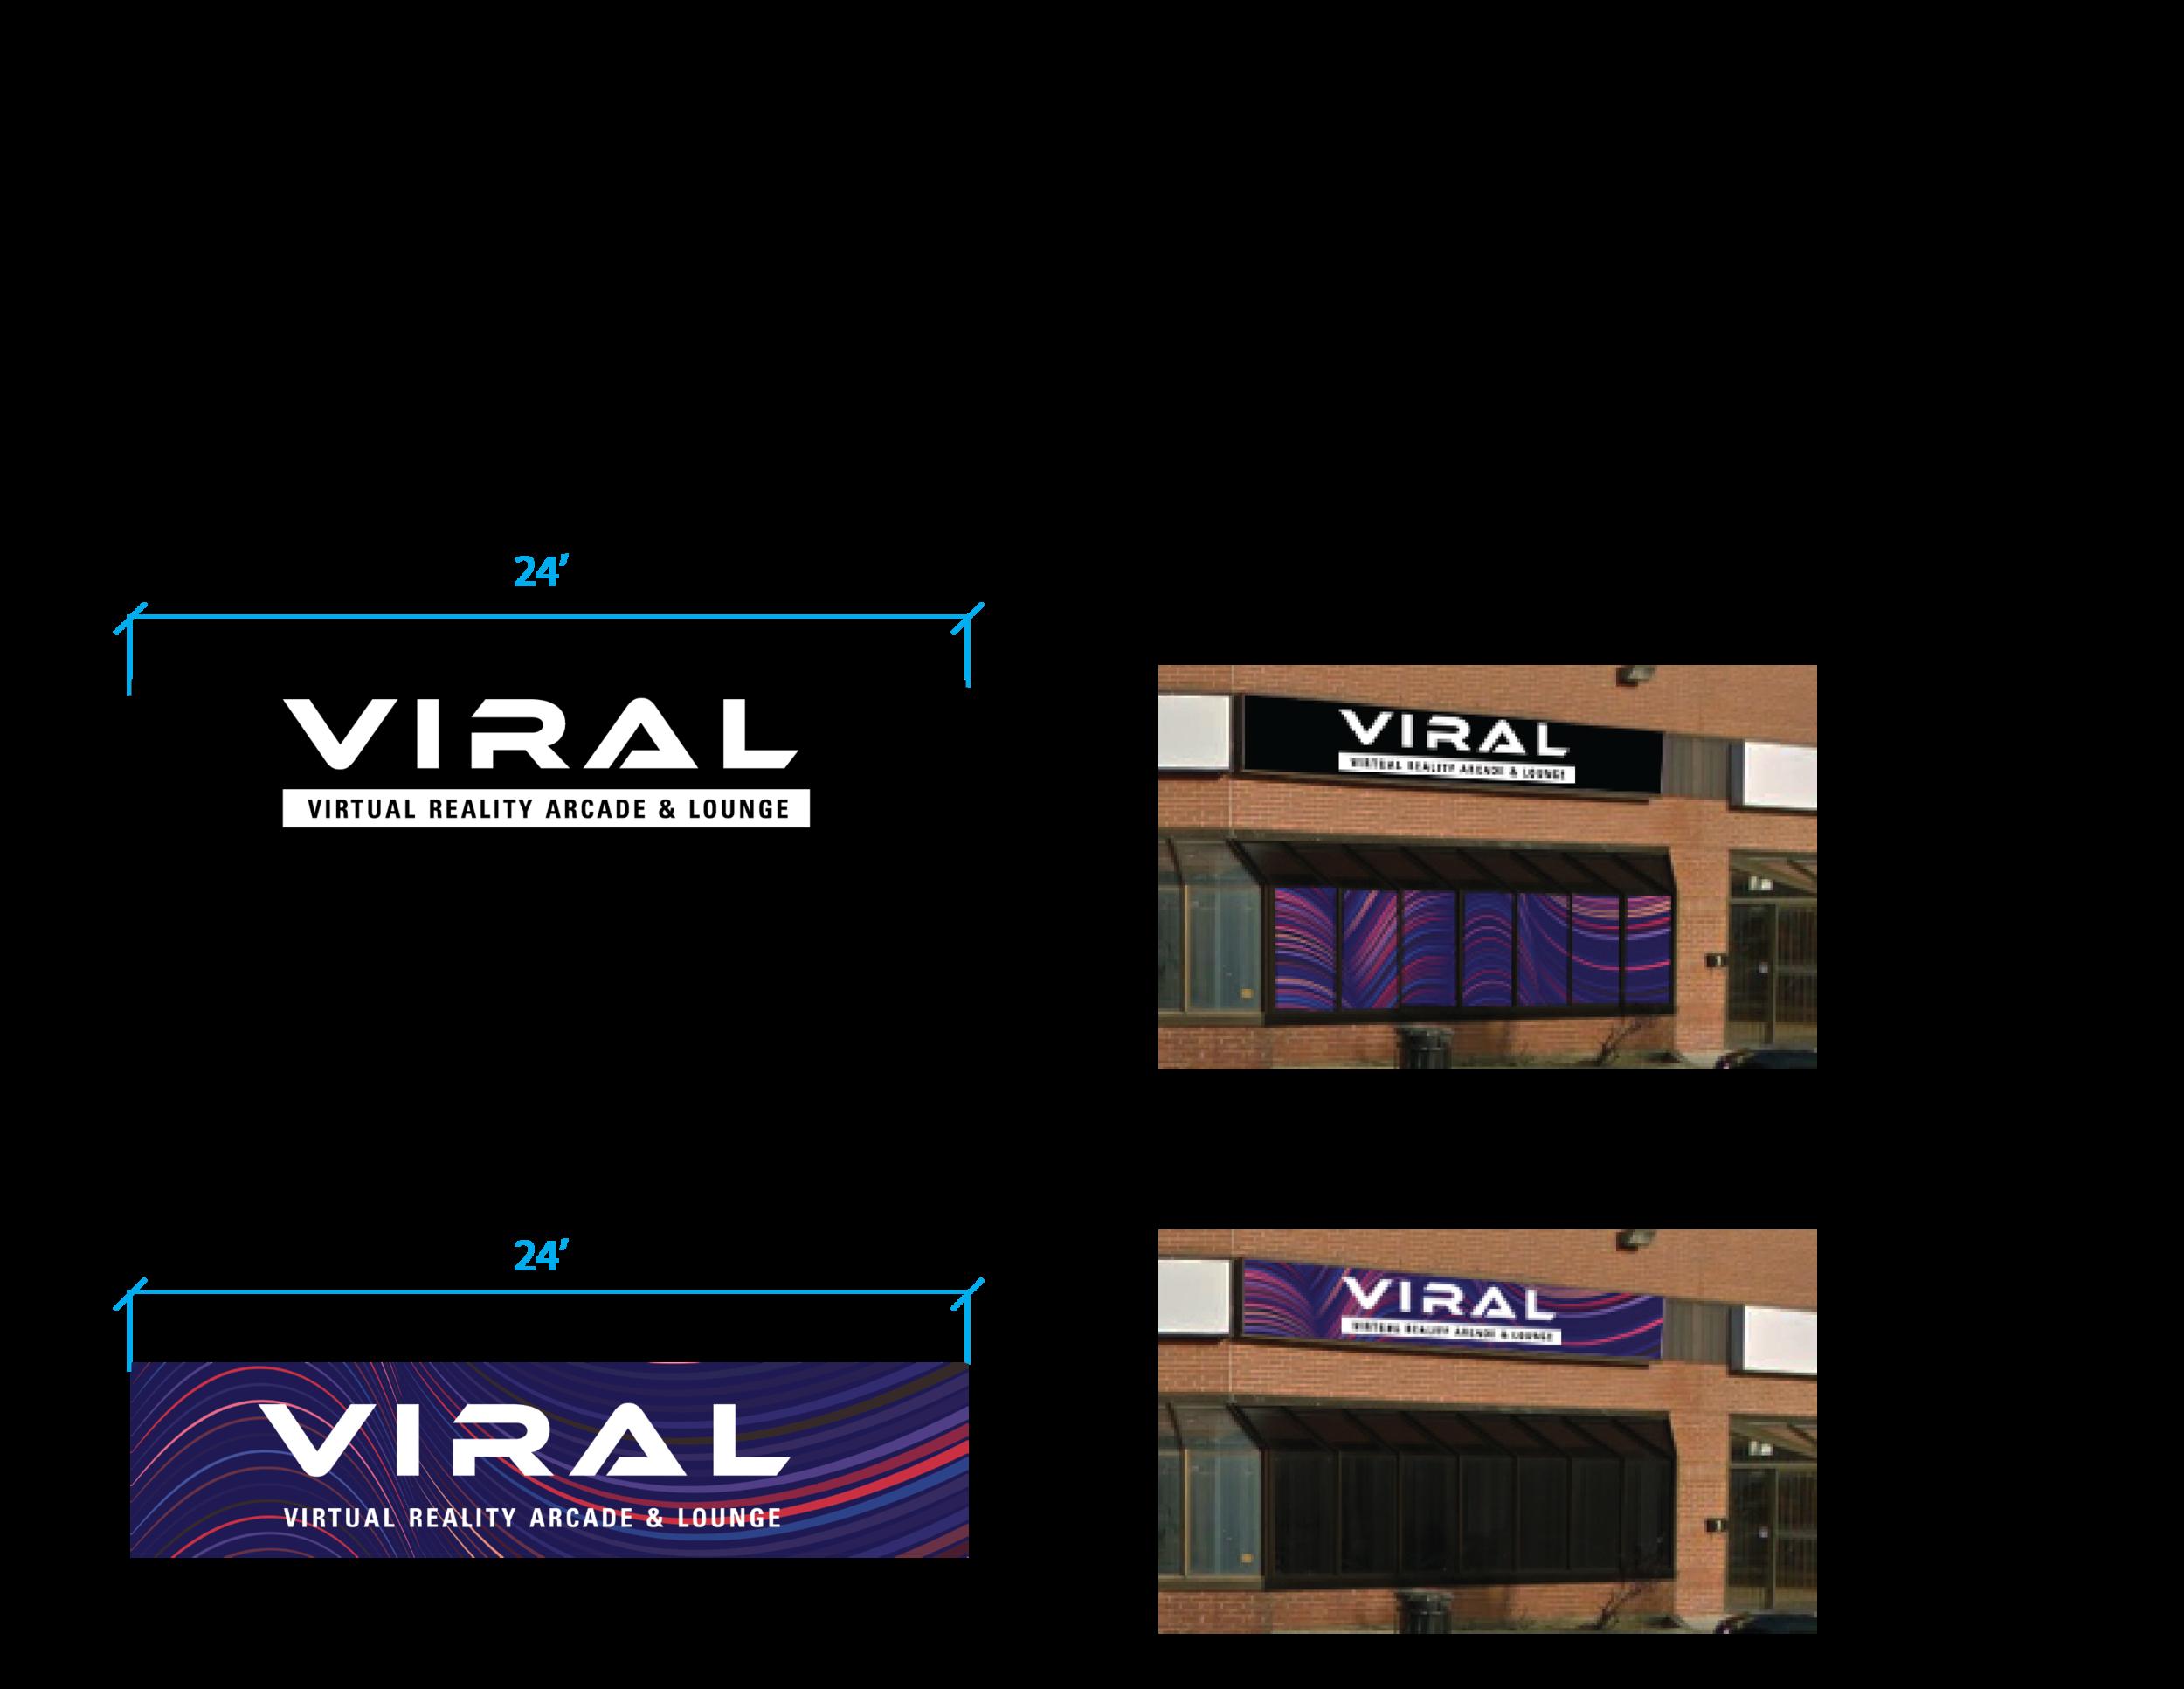 ViralBrand_InteriorExterior_SigangeGraphics_PrintQuote-05.png